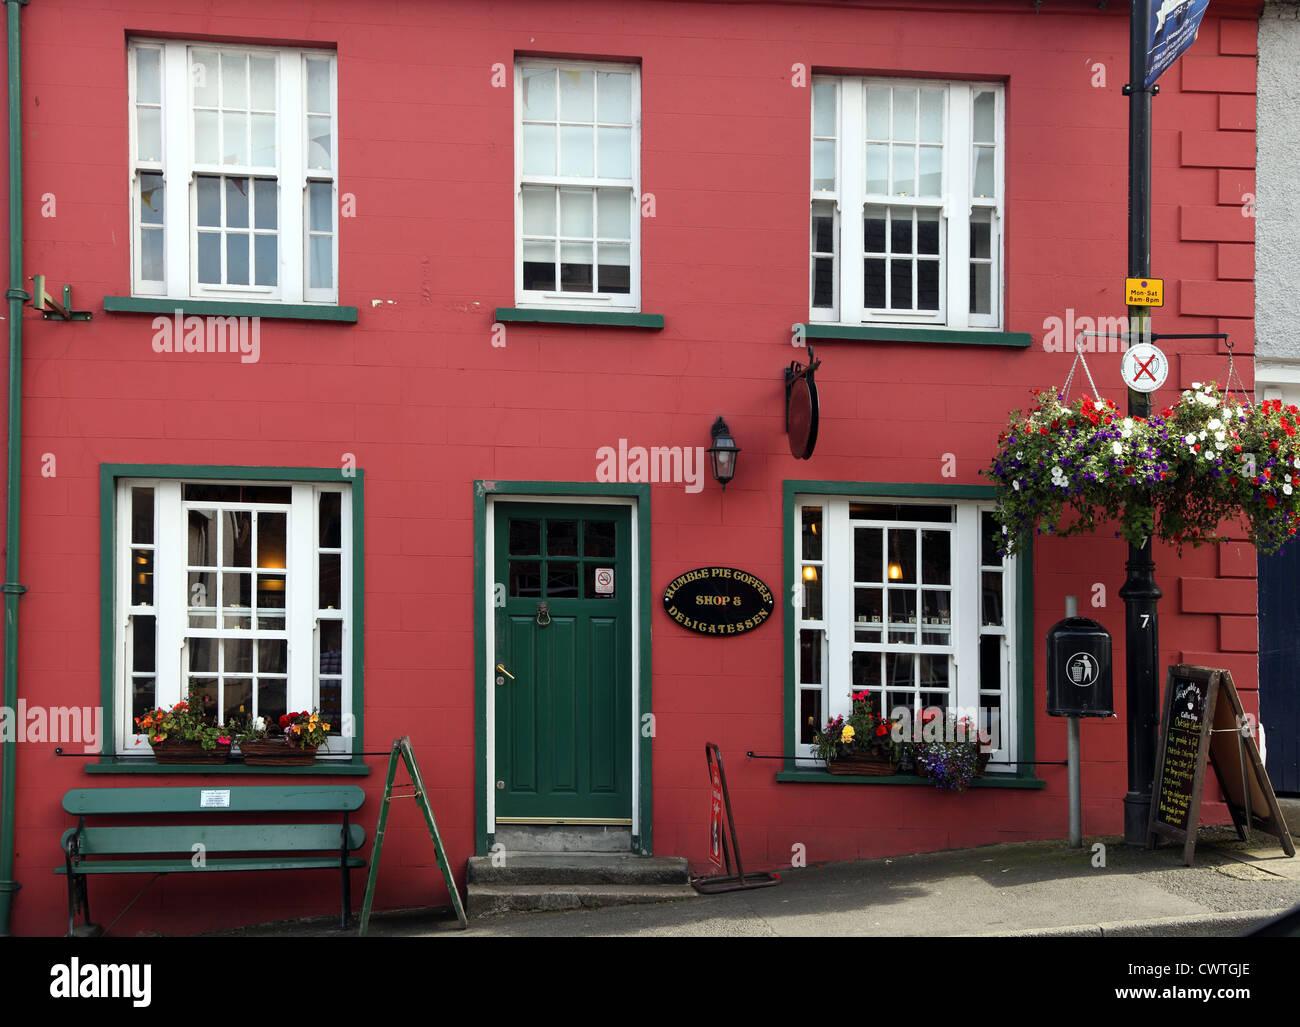 Humble Pie Coffee Shop & Delicatessen, Main St, Hillsborough, Co. Down, Ulster, Northern Ireland - Stock Image